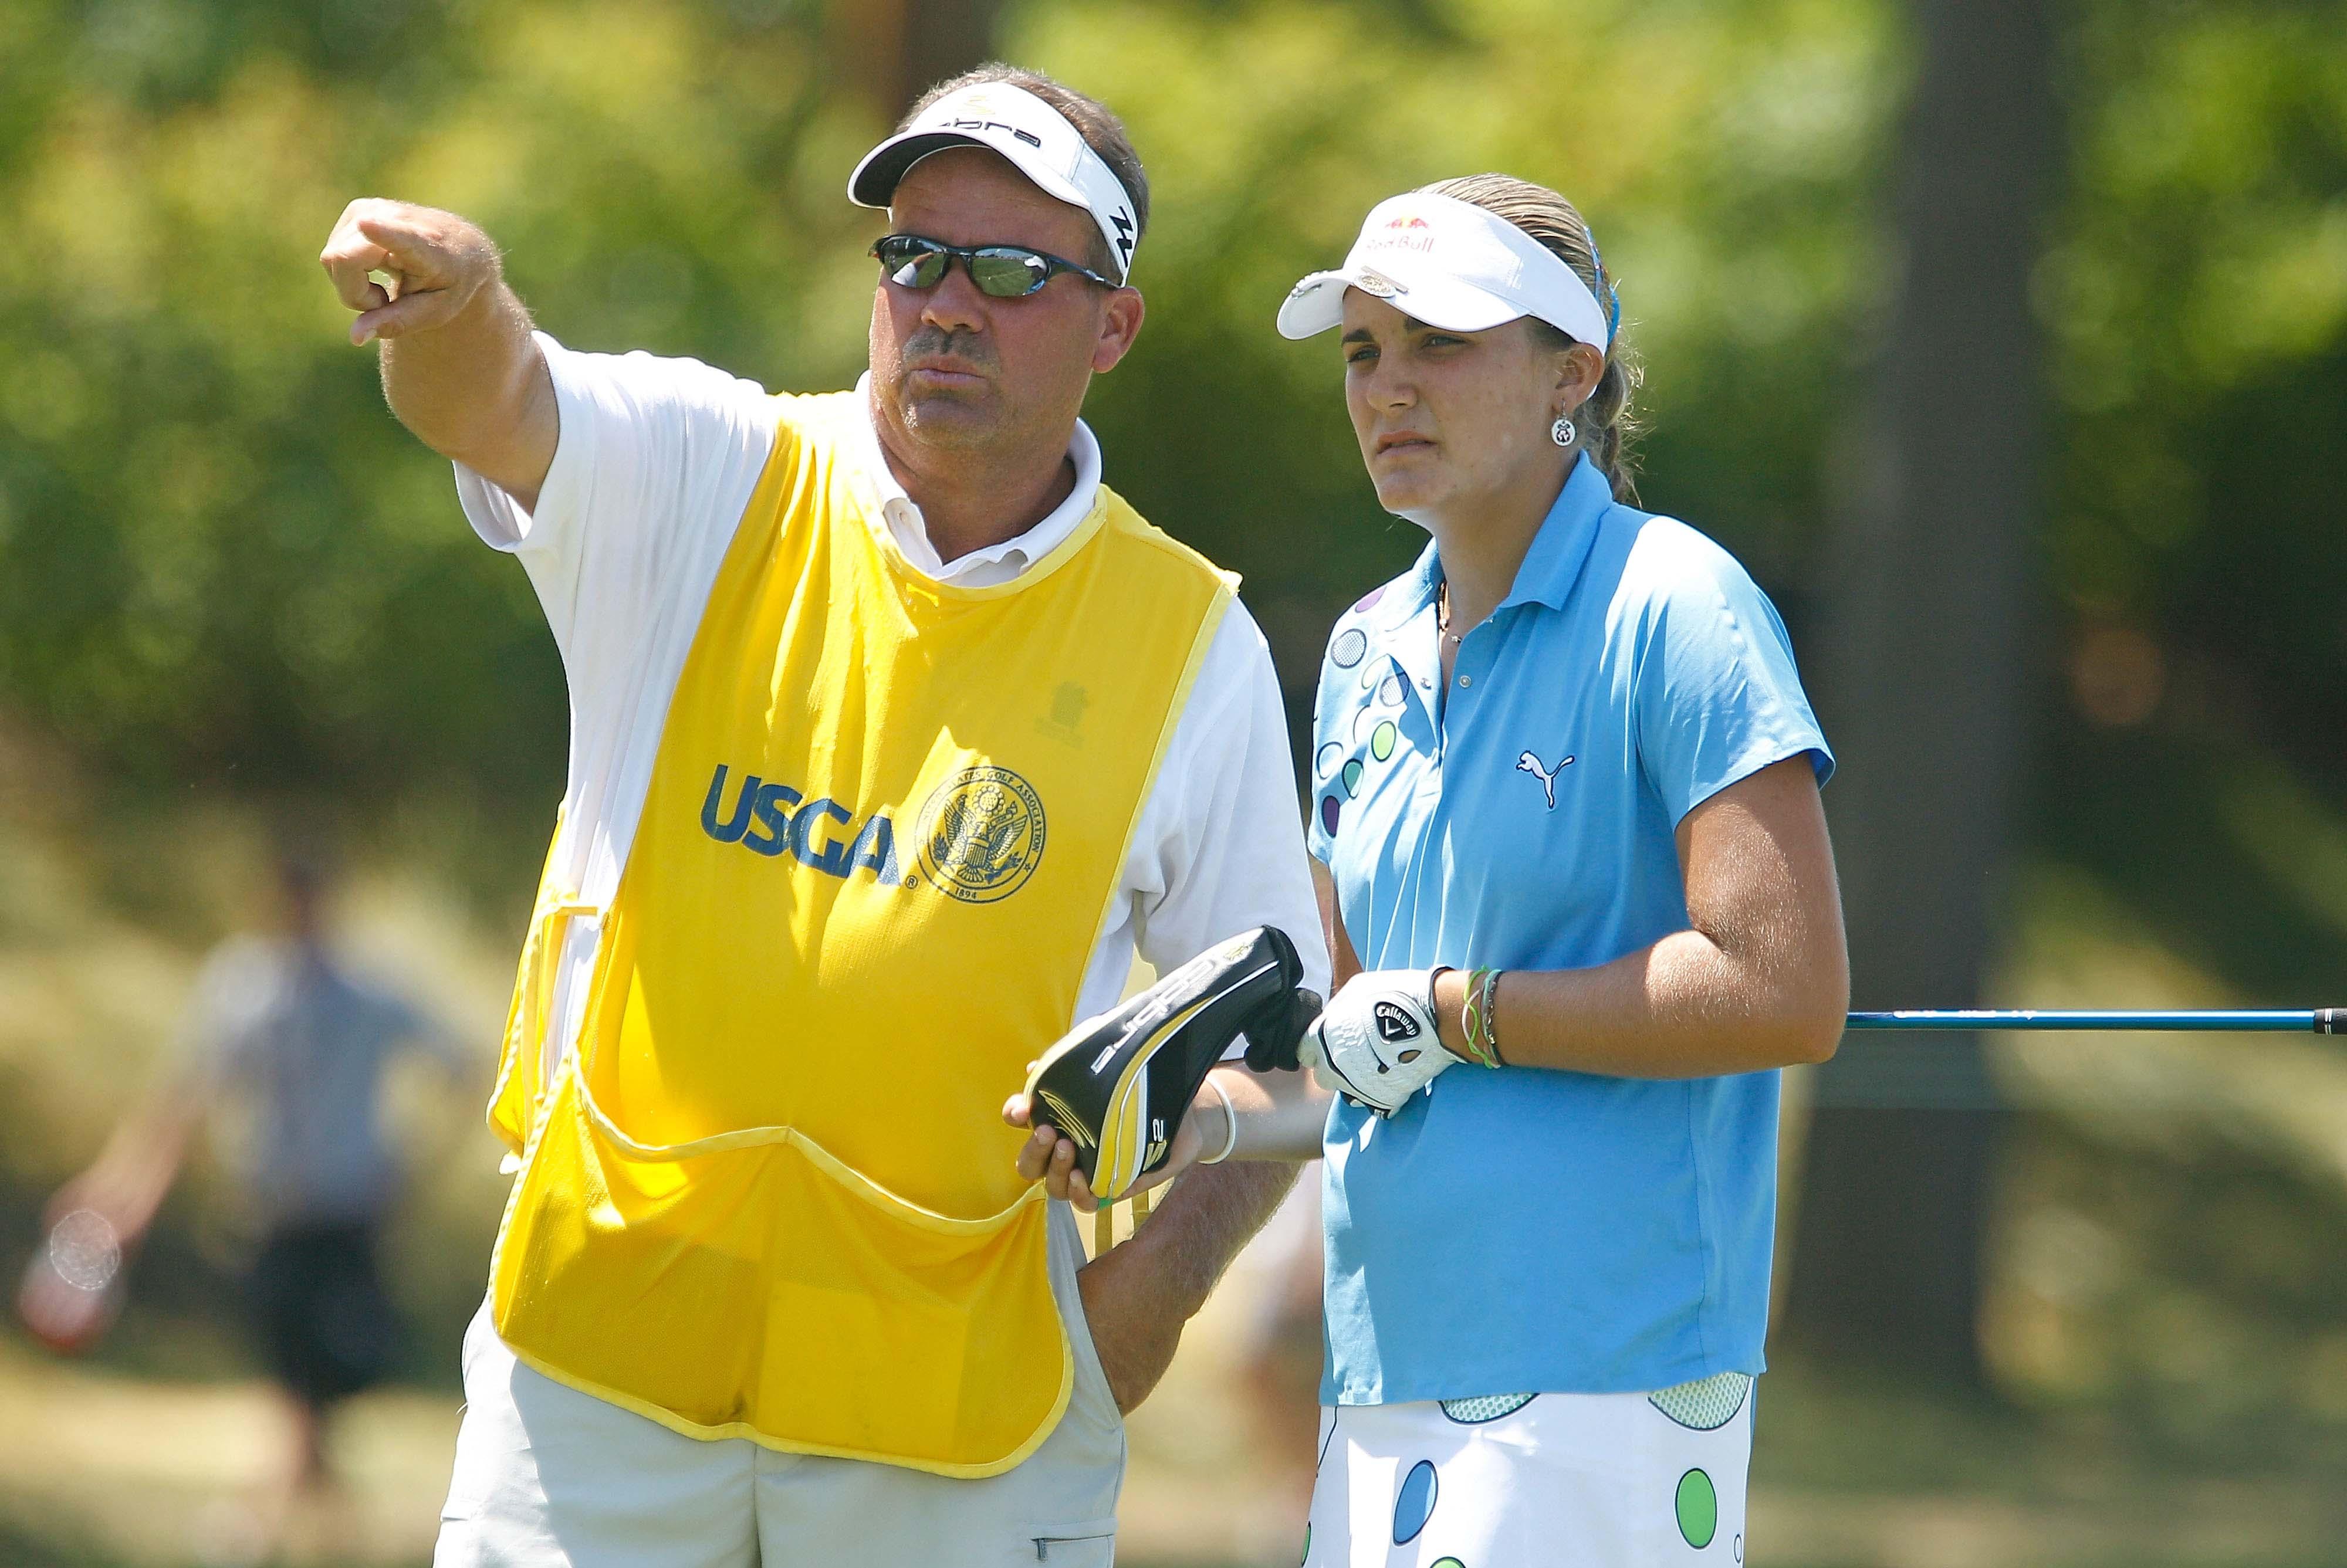 Lexi and Scott Thompson